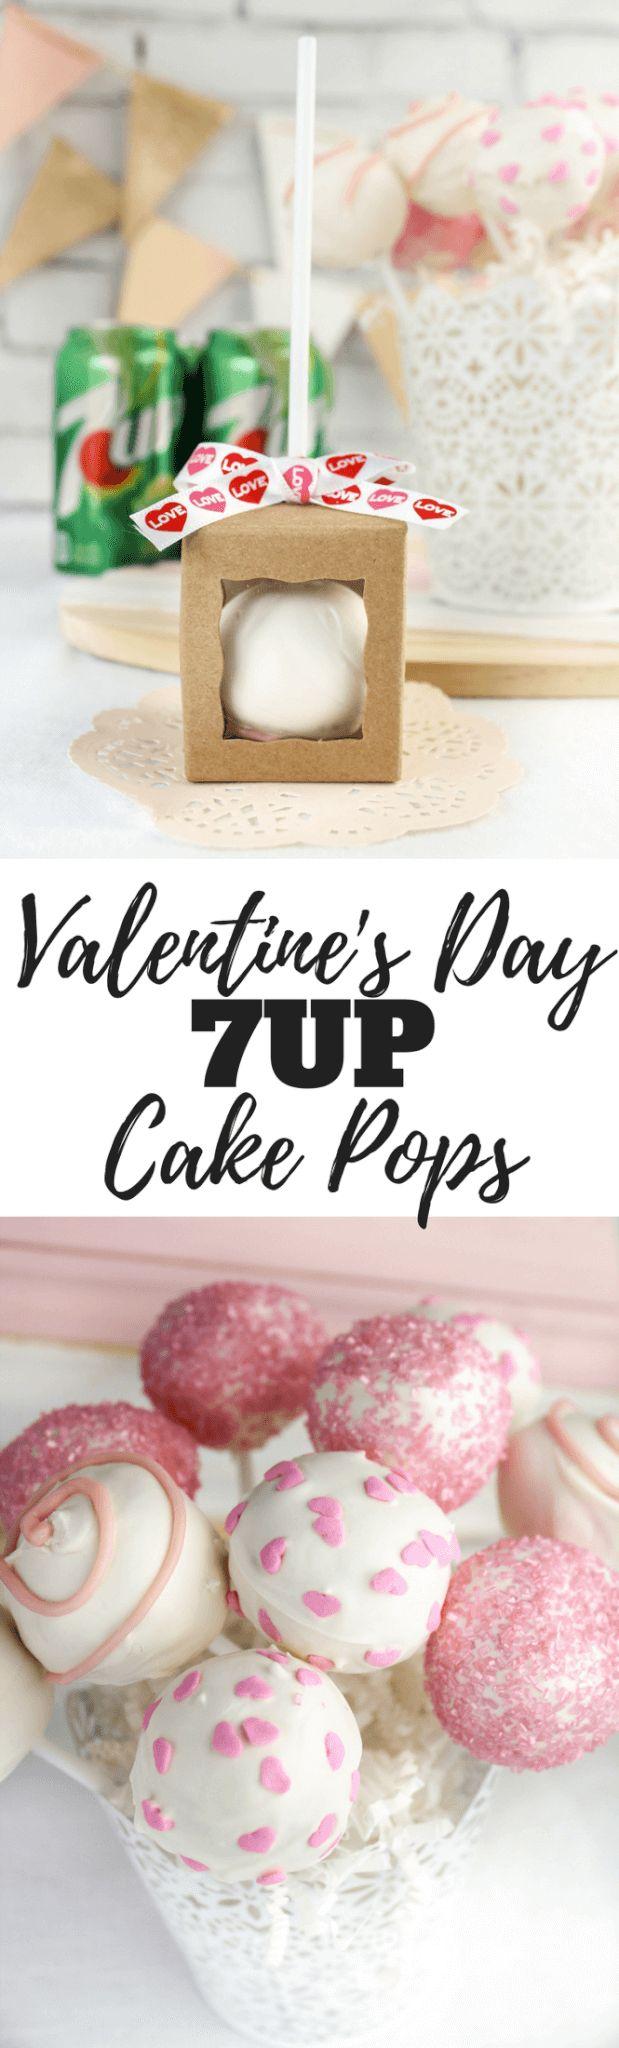 Valentine's Day 7UP Cake Pops, #ad, #JustAdd7UP, @Walmart @7up family friendly recipe, dessert